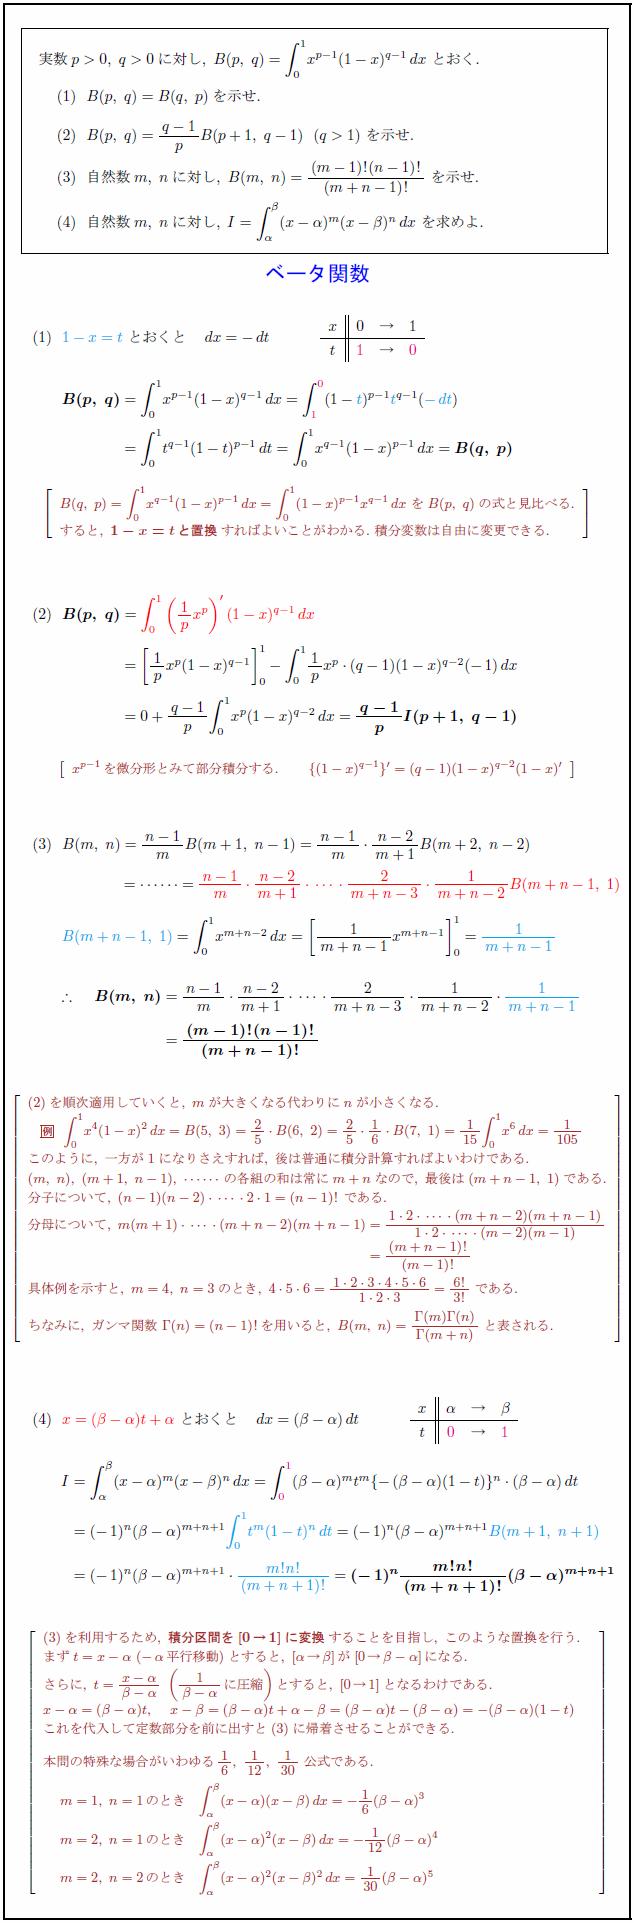 beta-function